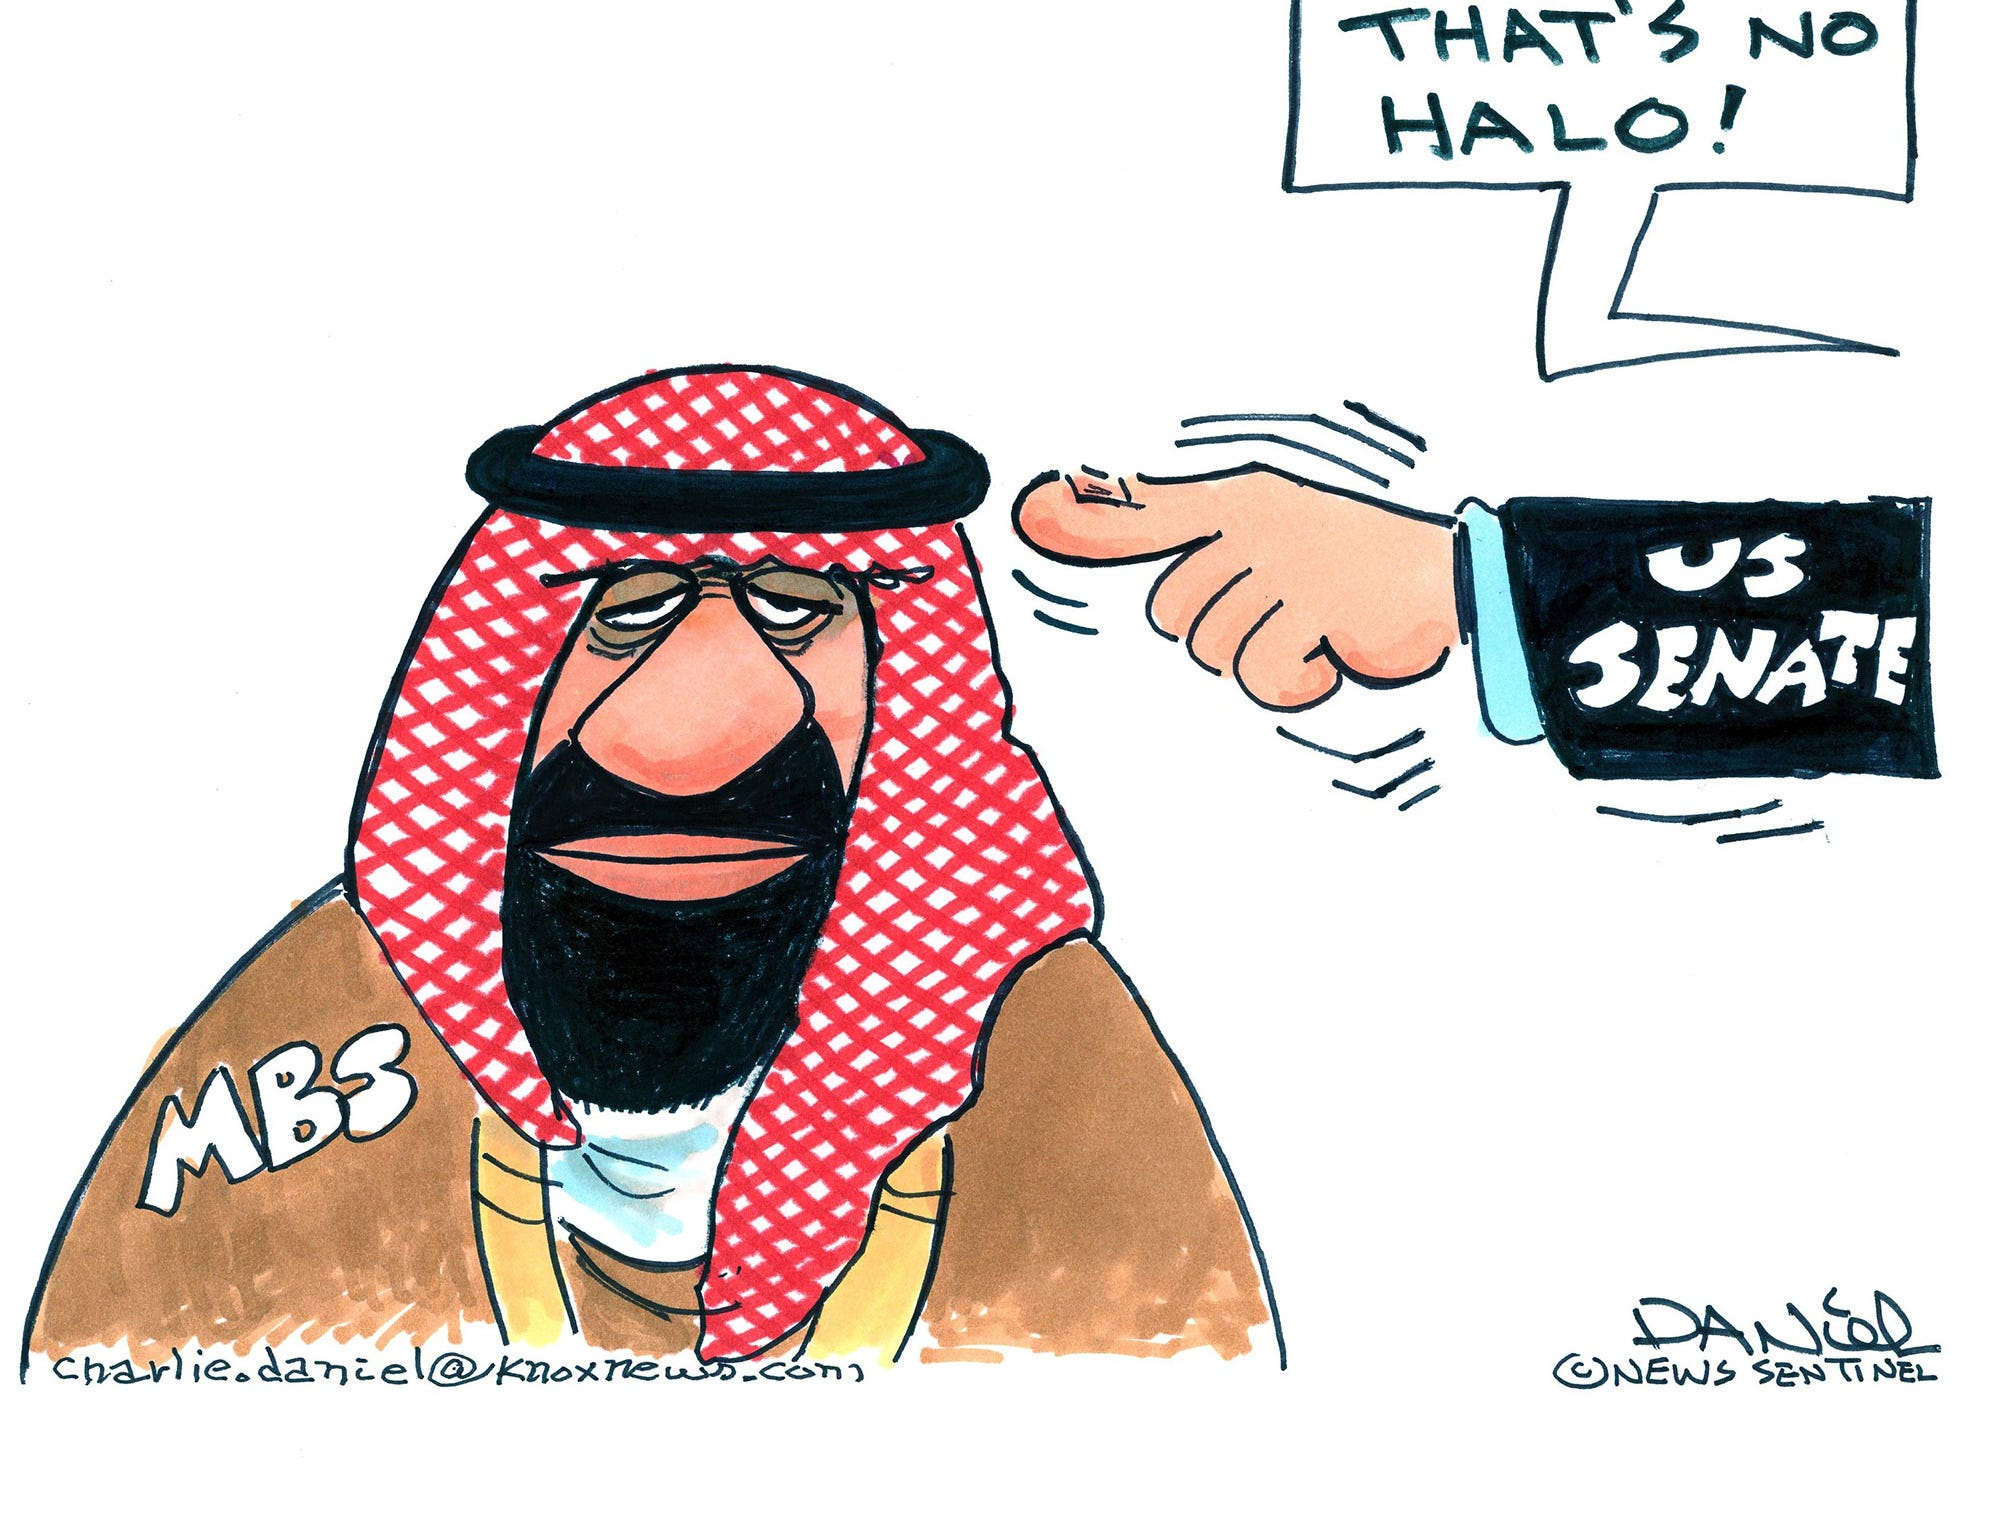 Charlie Daniel cartoon for Dec. 17, 2018